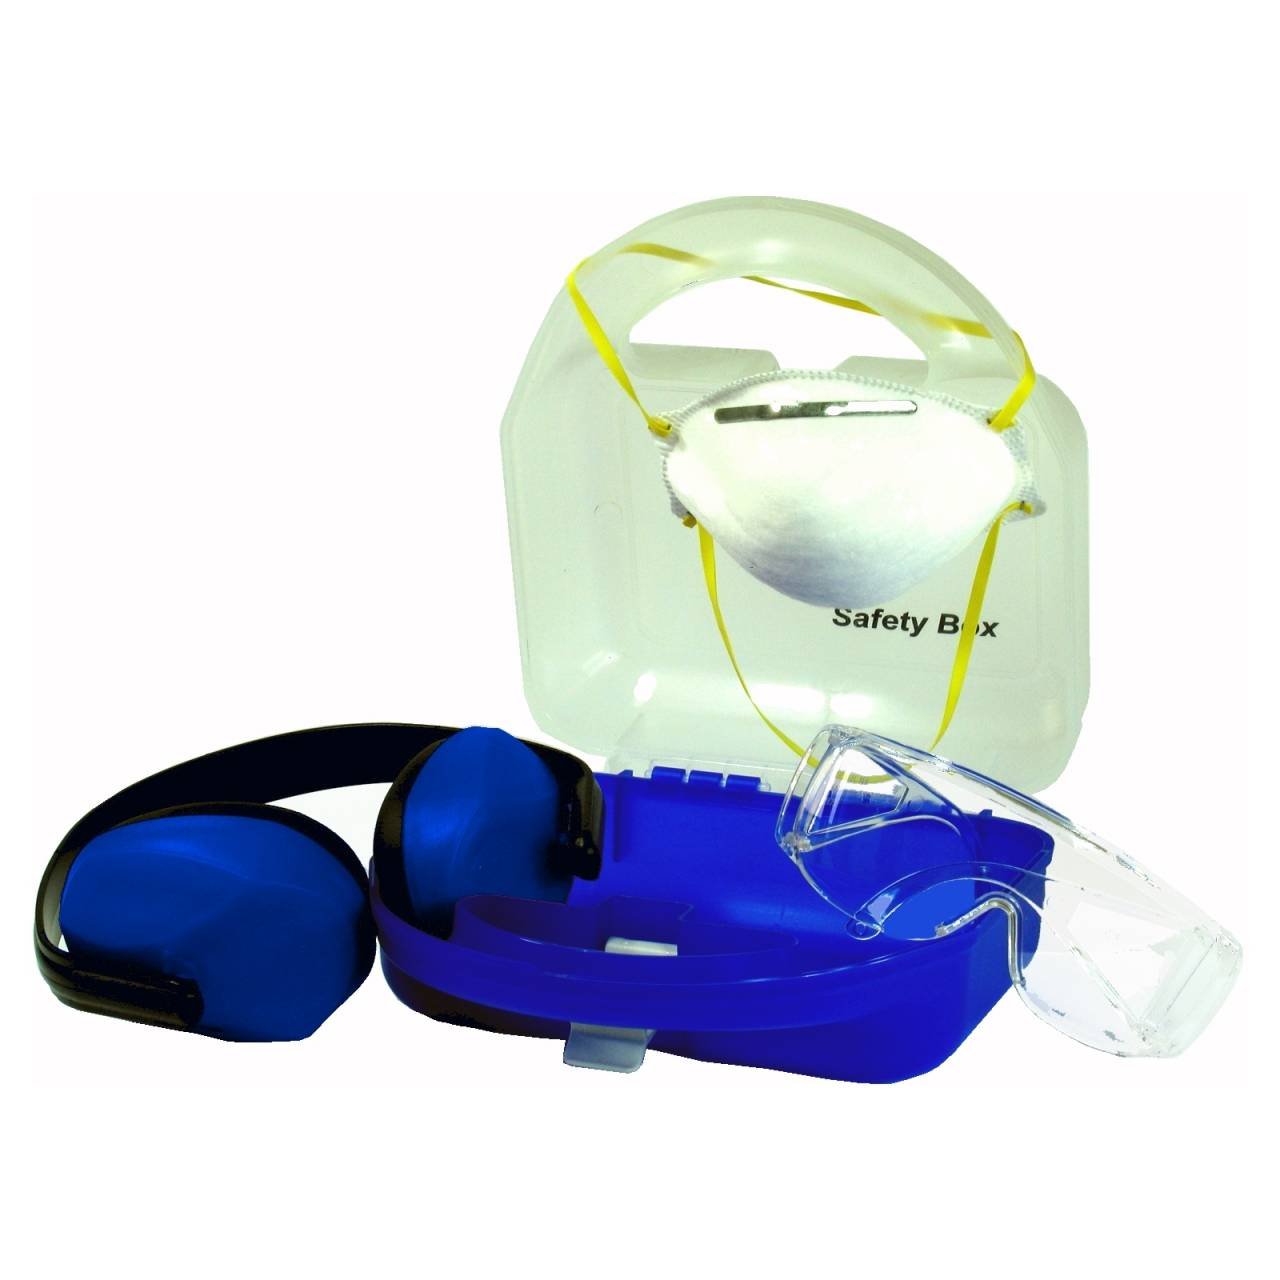 Safety-Box 'Atem-Auge-Gehör' / 3-teiliges Komplettset